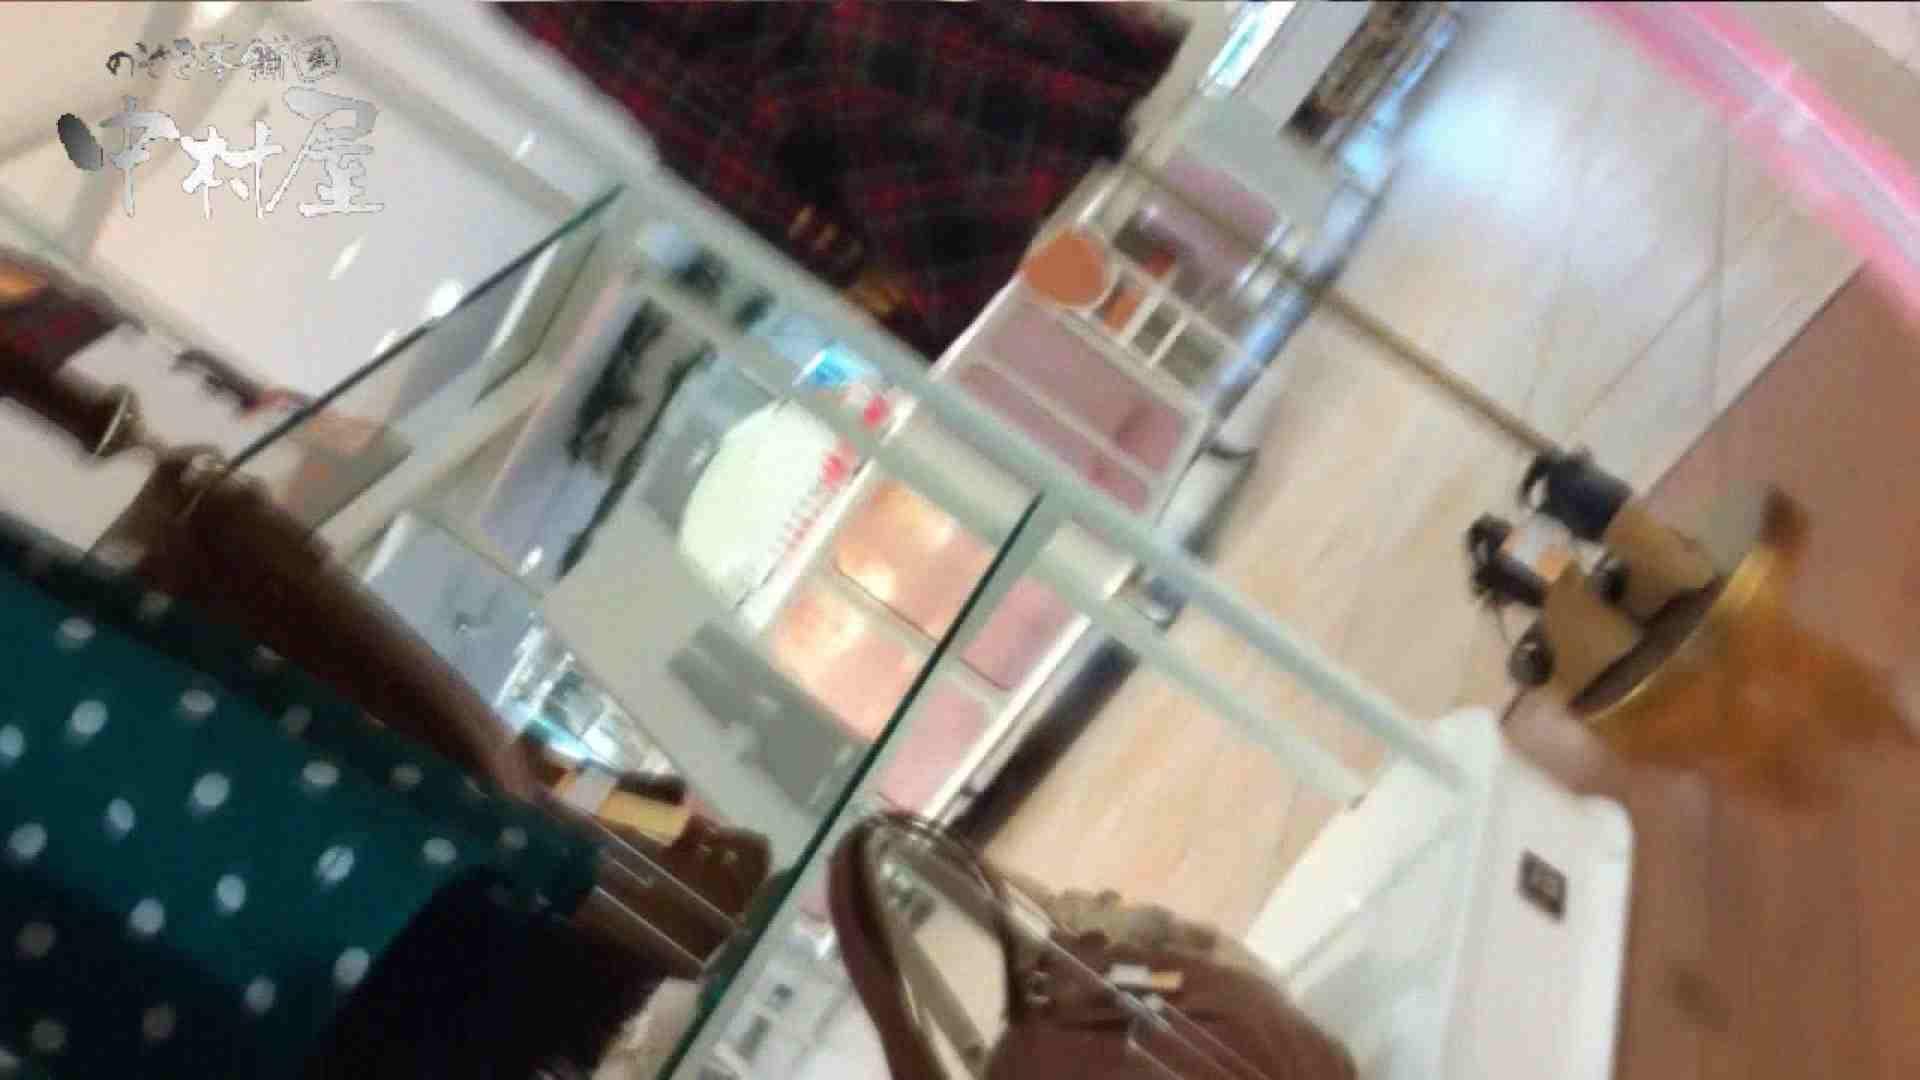 vol.48可愛いカリスマ店員胸チラ&パンチラ アニメ声の店員さん 胸チラ  96Pix 64